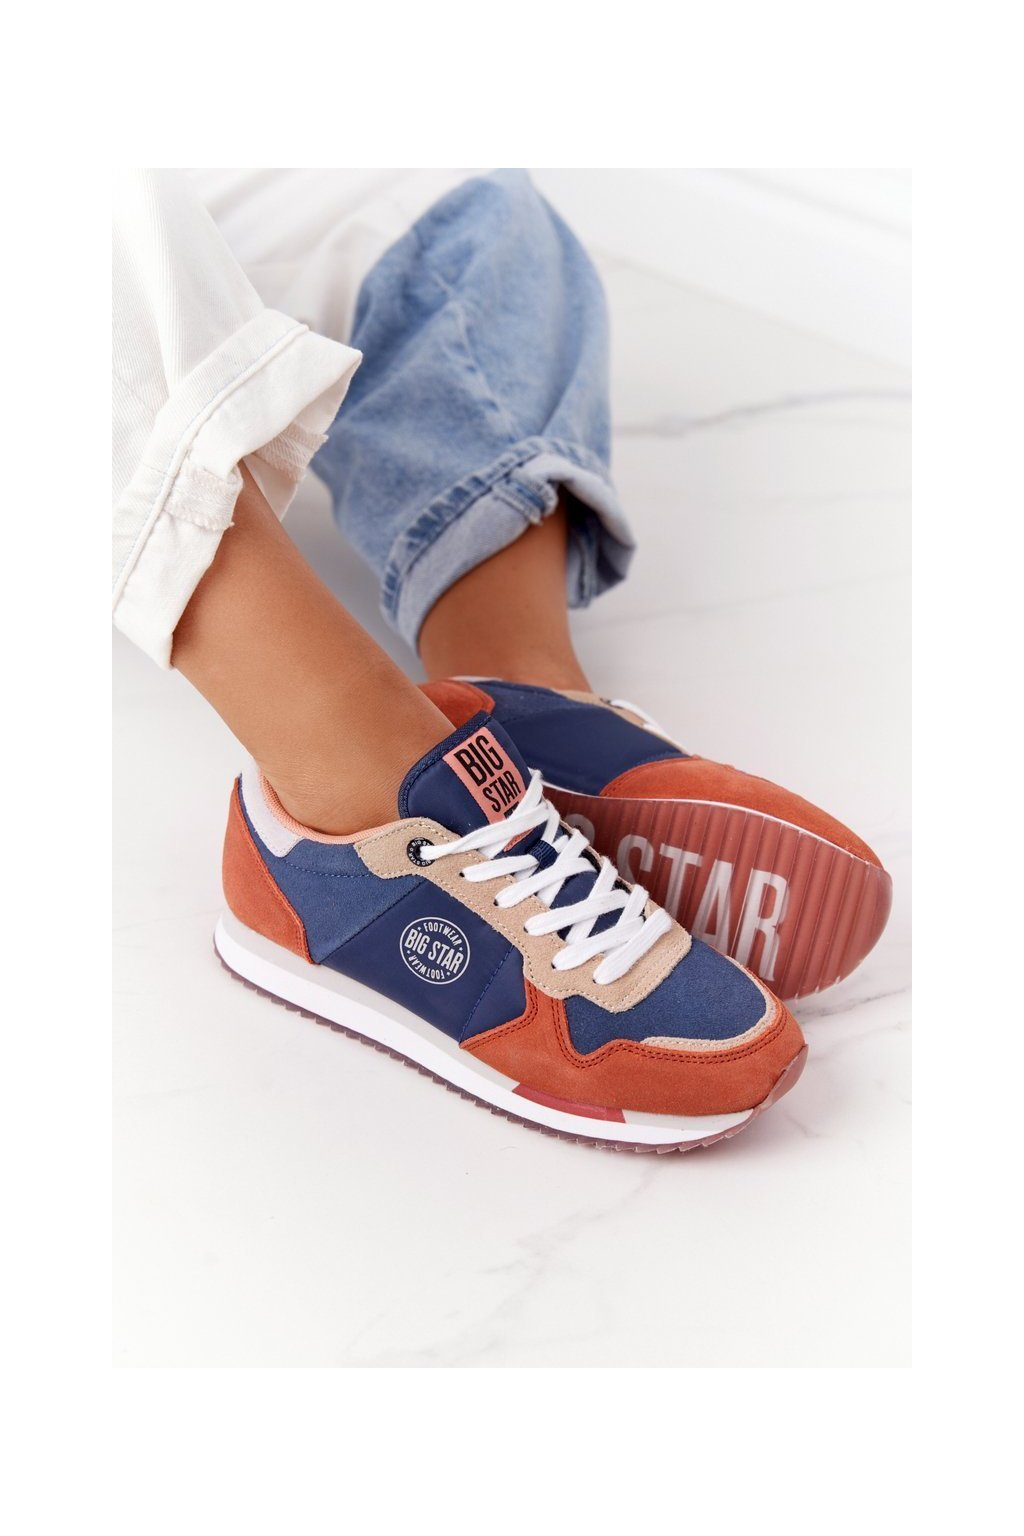 Dámske tenisky farba oranžová kód obuvi HH274567 BLUE/ORANGE